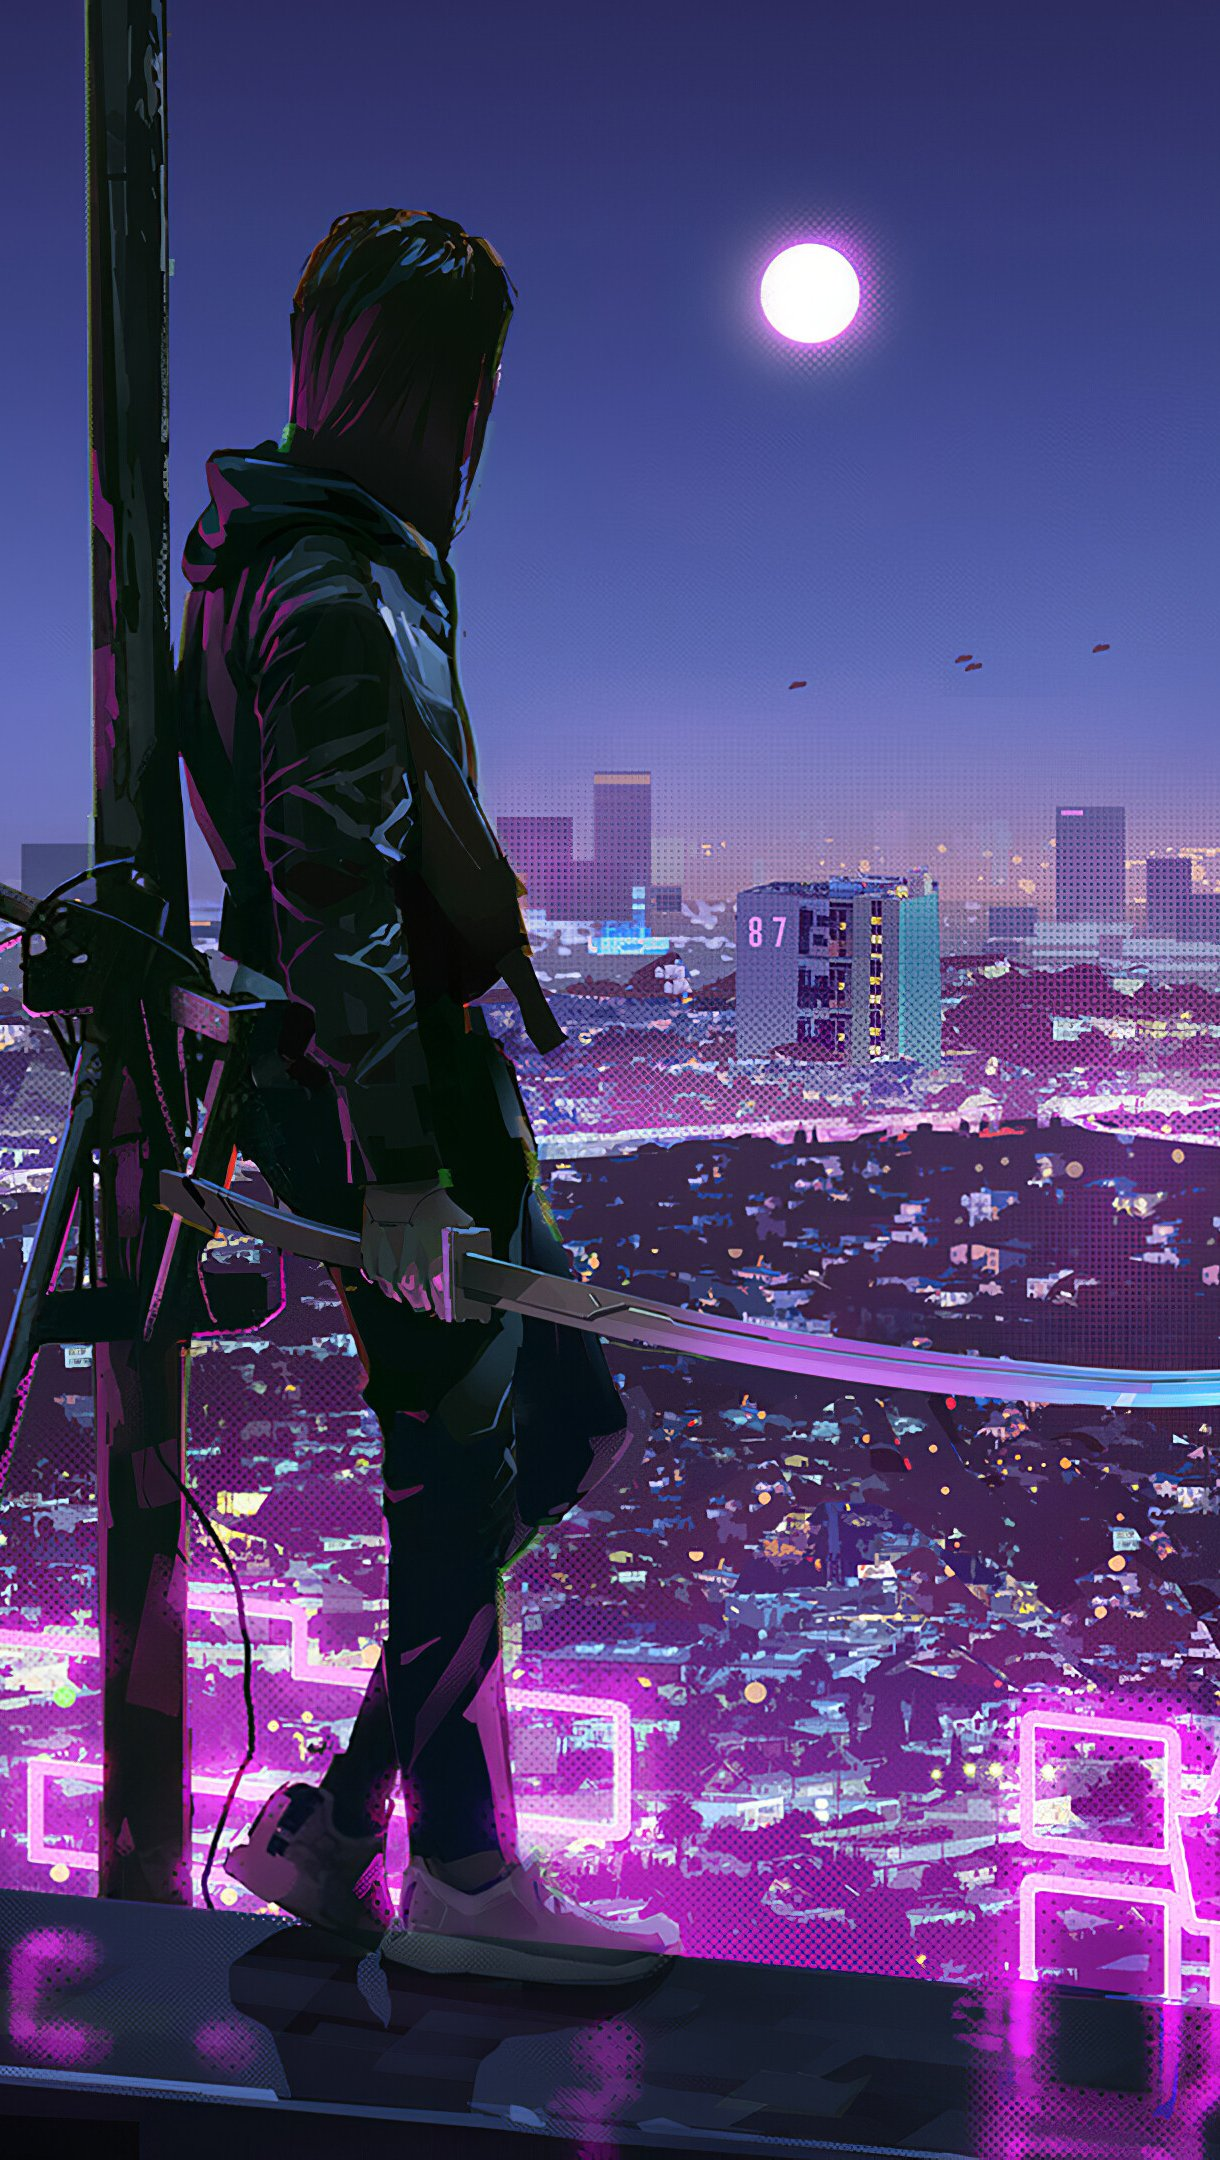 Fondos de pantalla Ninja Katana Sci-Fi City Neon Lights Vertical